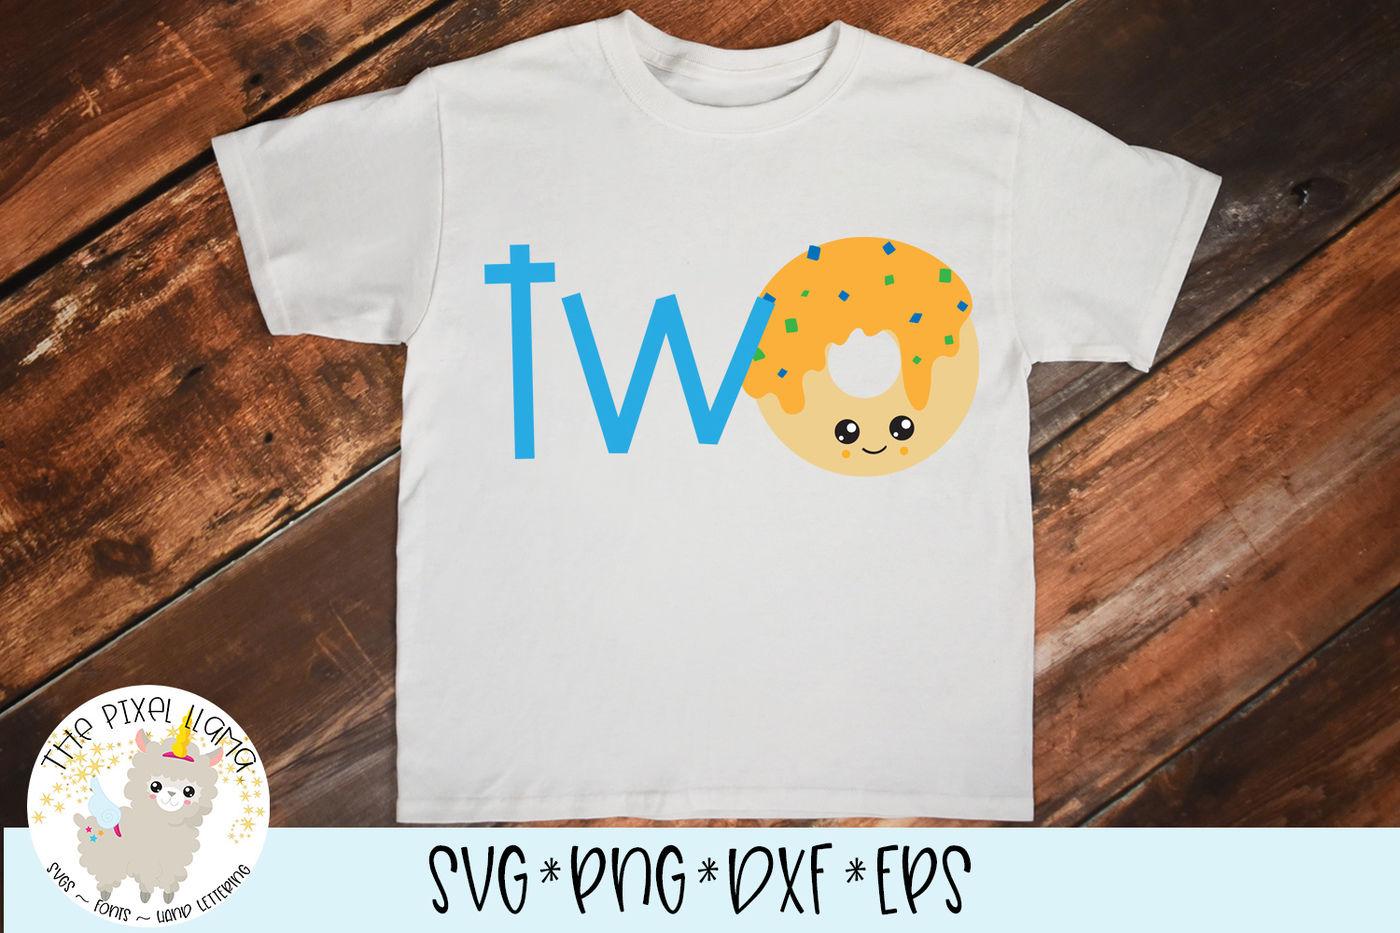 Two Donut Birthday Svg Cut File By The Pixel Llama Thehungryjpeg Com